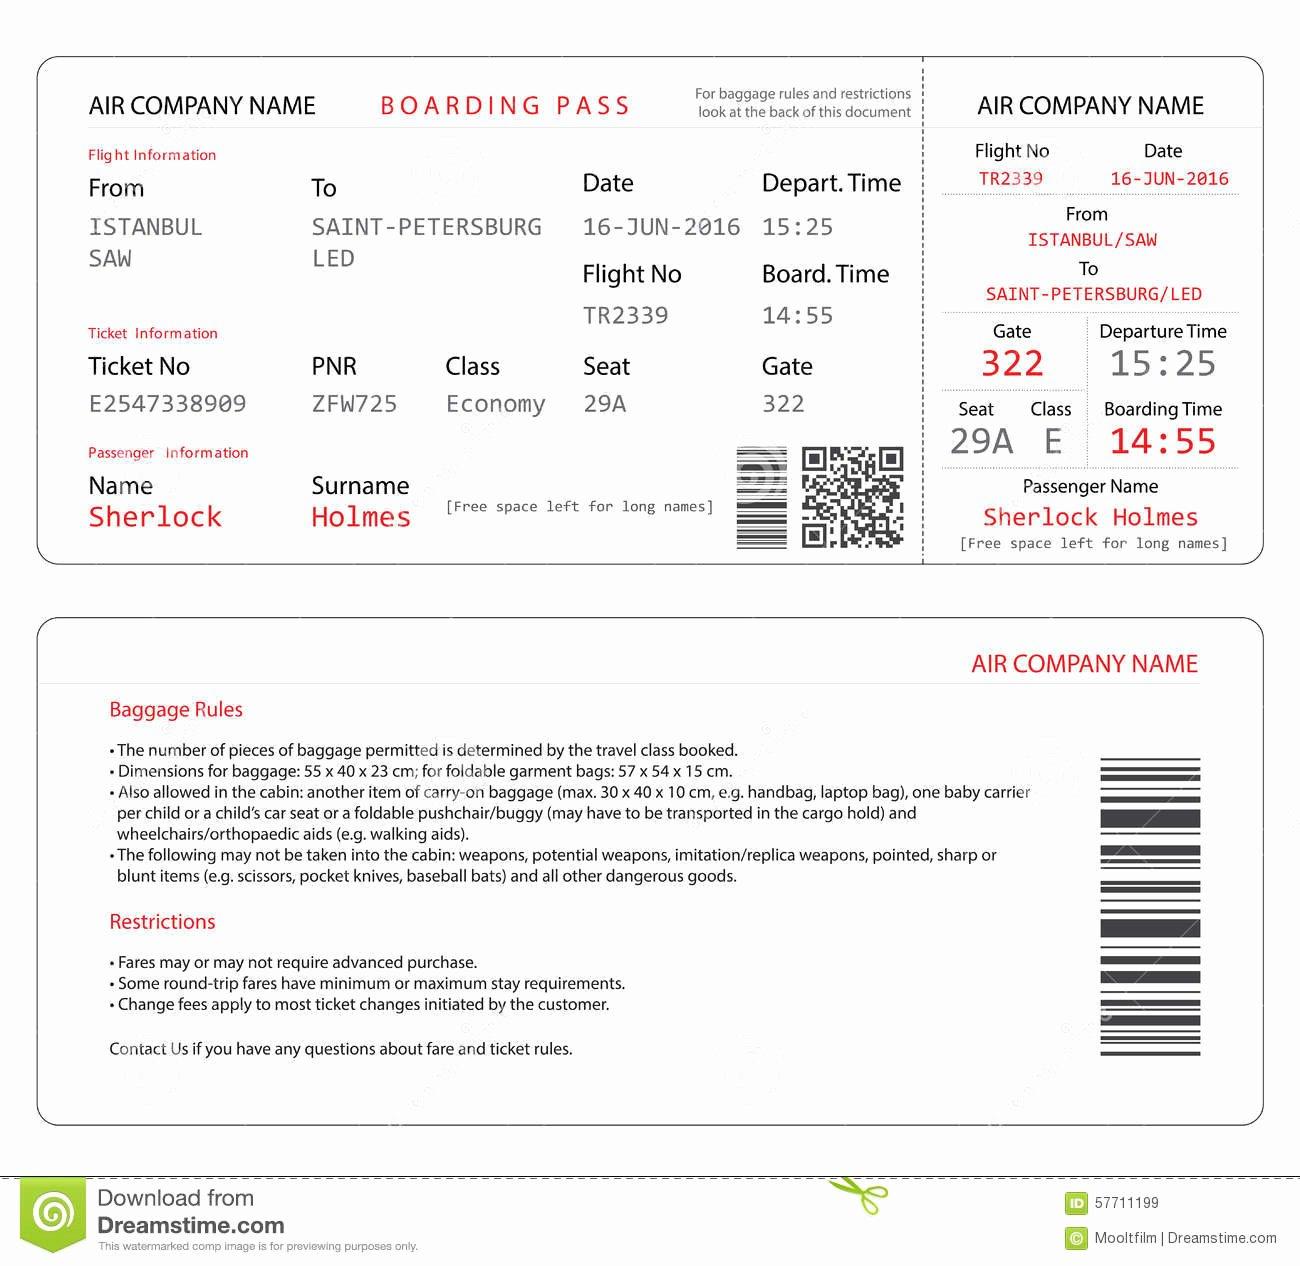 Boarding Pass Template Free Inspirational Boarding Pass Invitations Templates